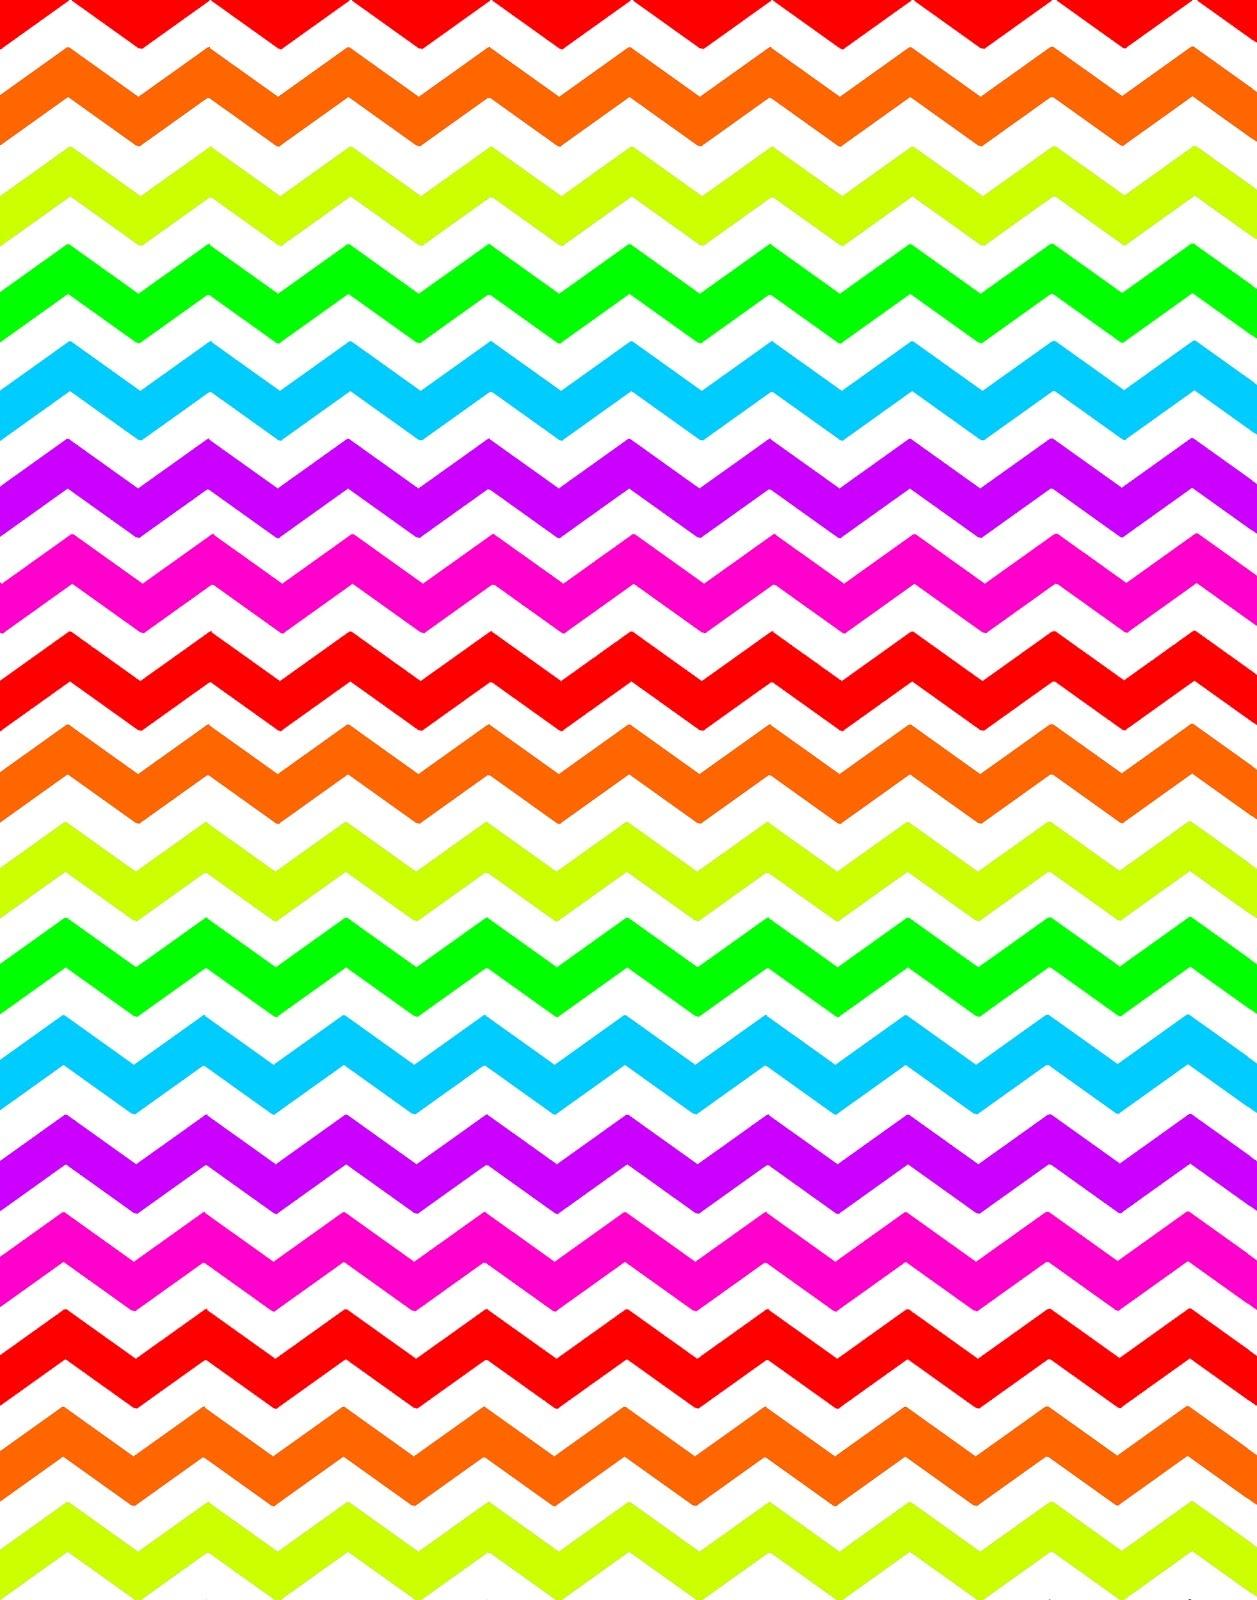 16 New Colors Chevron Background Patterns! - Chevron Pattern Printable Free